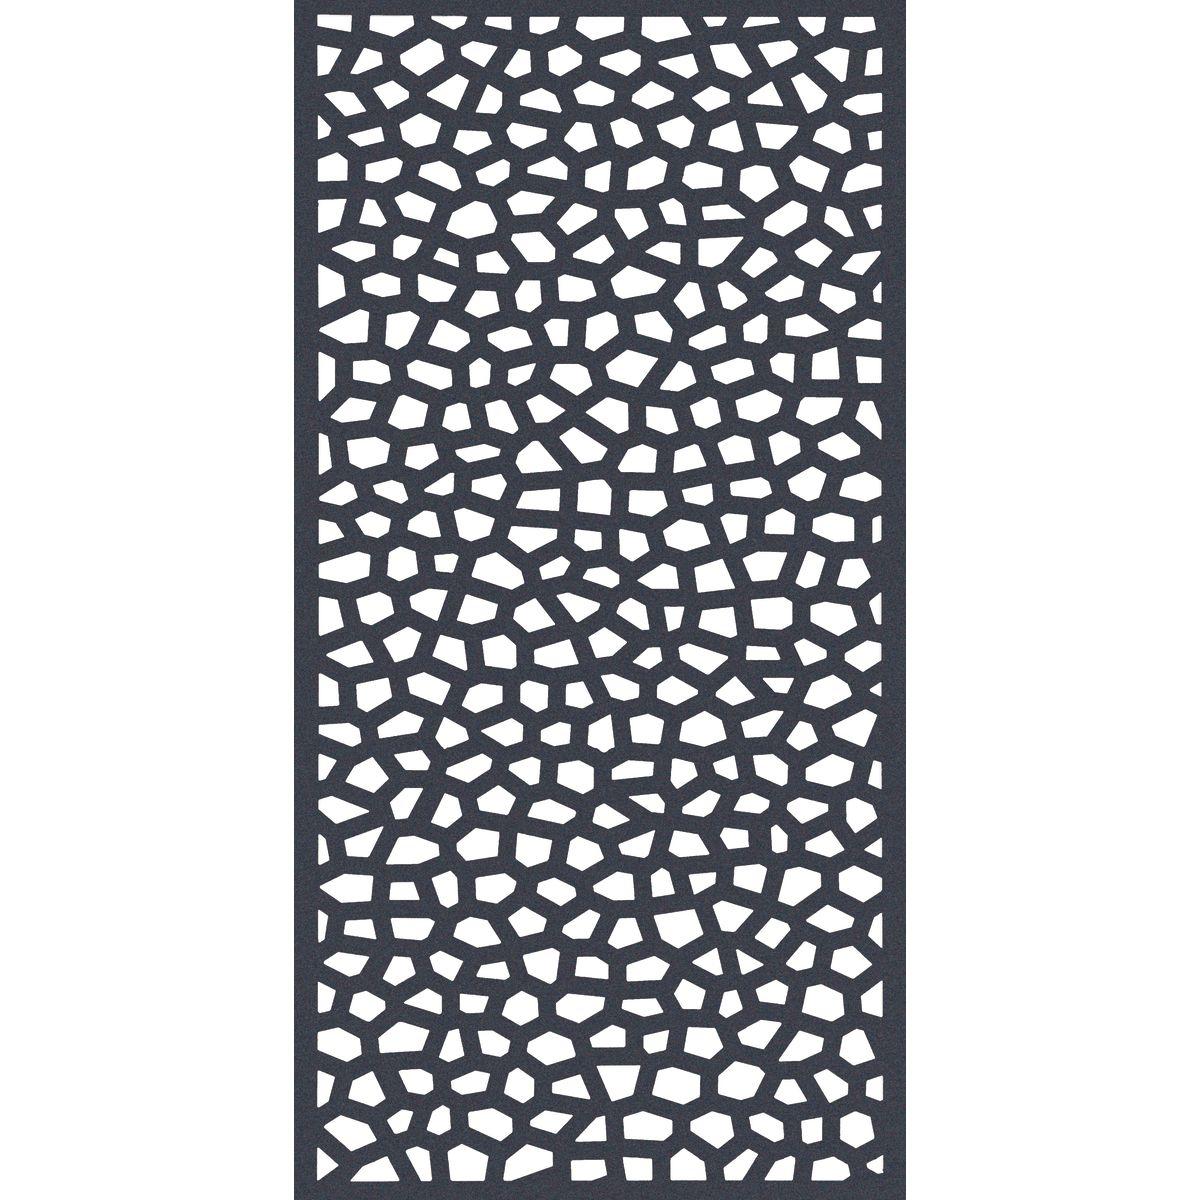 Pannello mosaic 100 x 200 cm prezzi e offerte online for Stendibiancheria leroy merlin